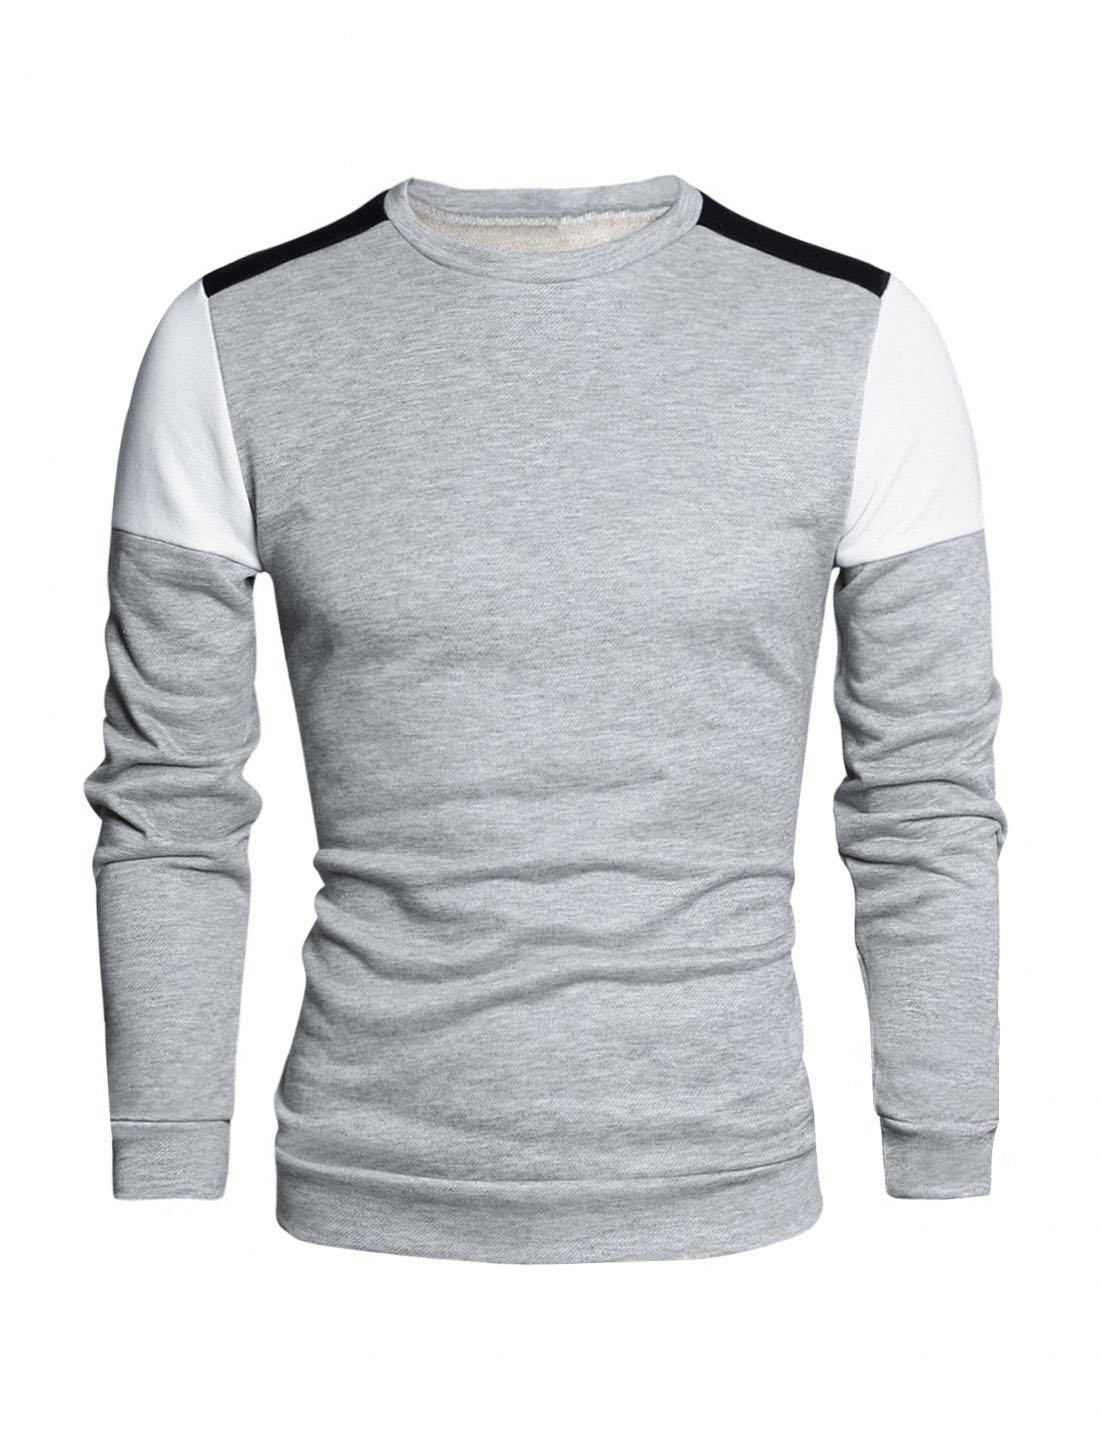 Men Color Block Crew Neck Long Sleeves Panel Design T-Shirt Light Gray S